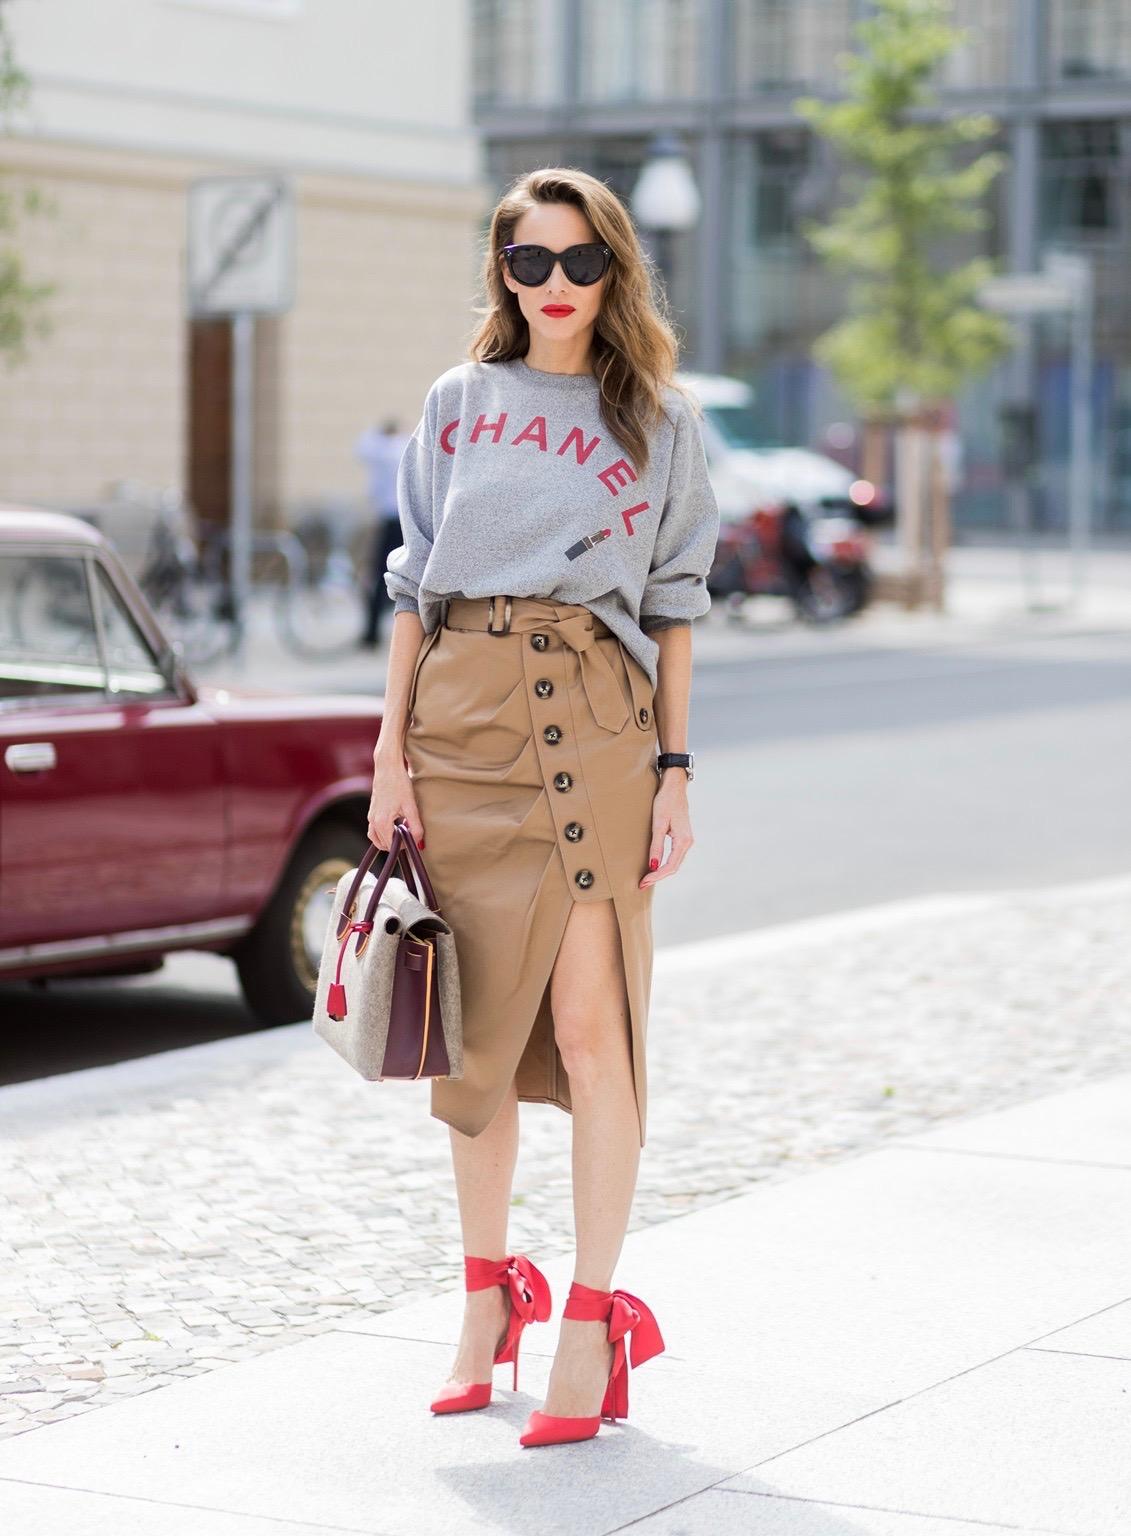 Chanel Berlin vintage sweater chanel alexandra lapp